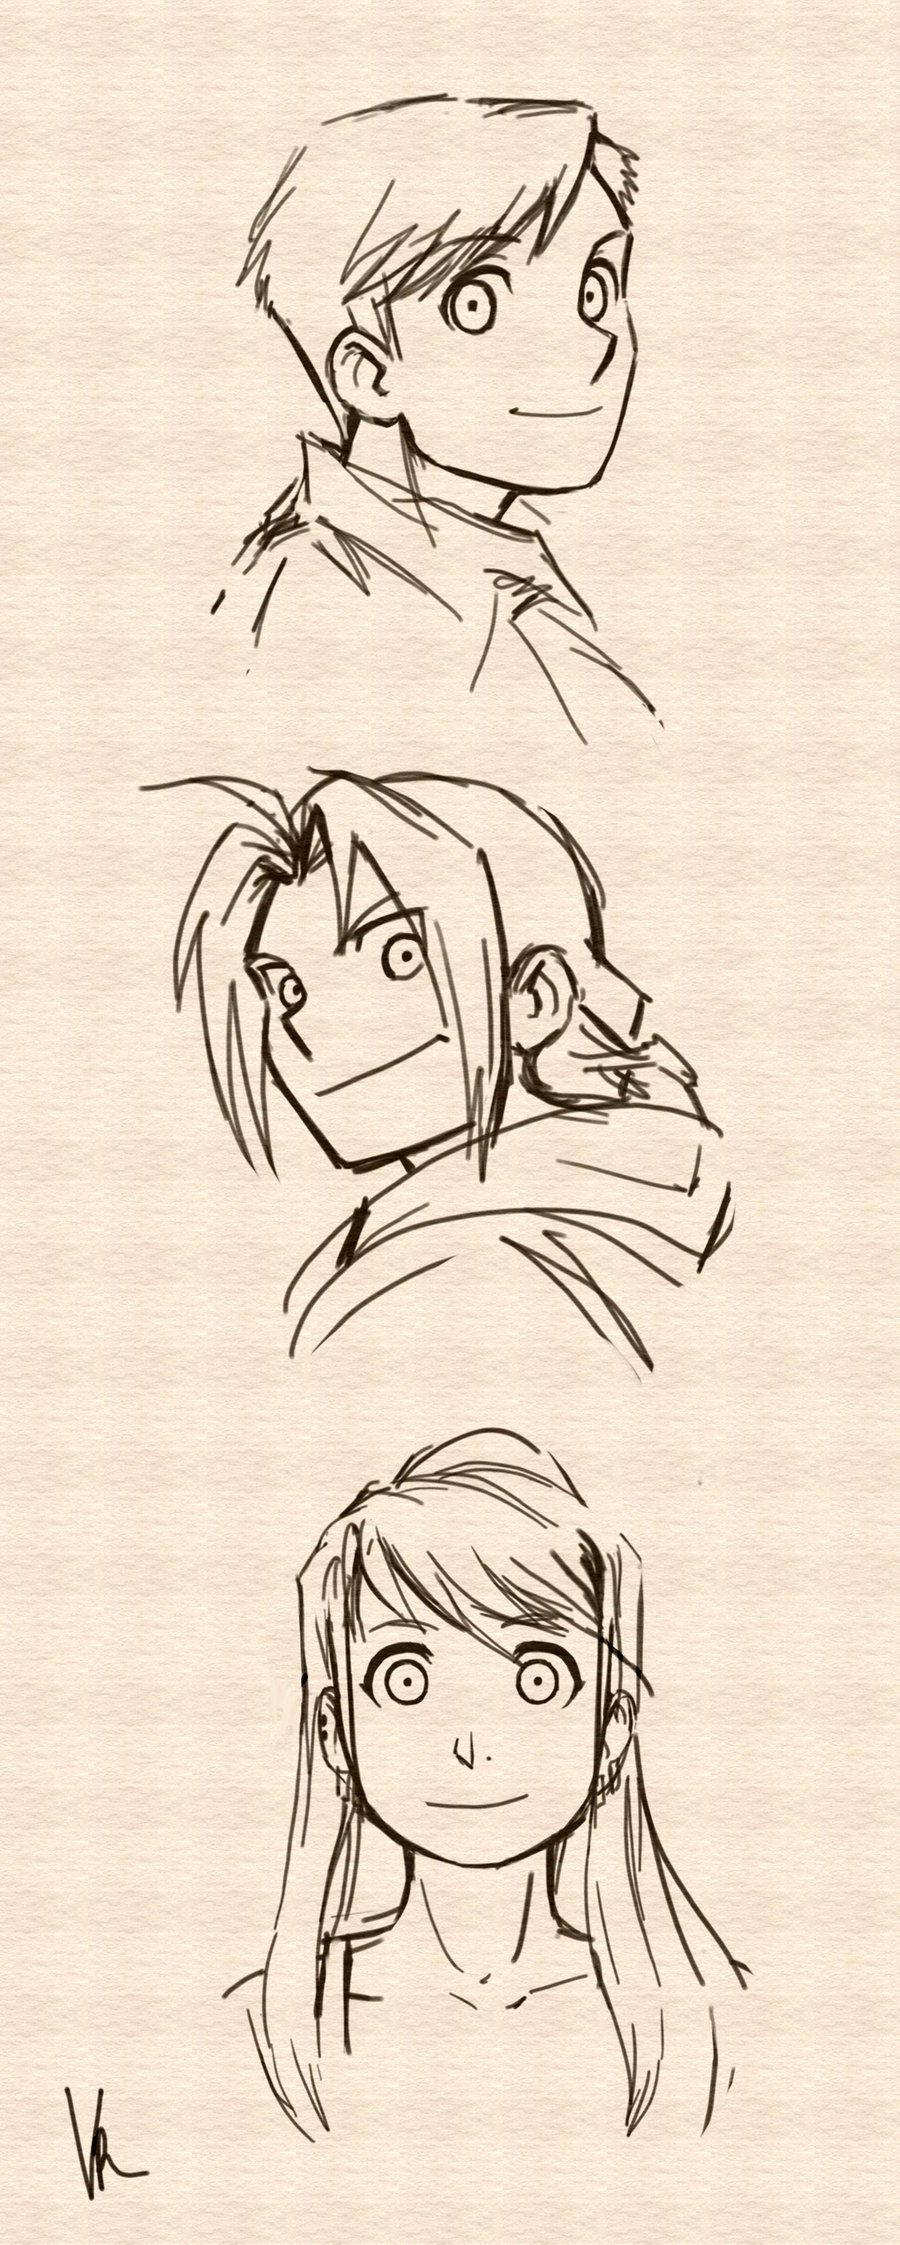 Full Metal Alchemist - Edward, Alphonse, Winry: character sketches, FMA, anime